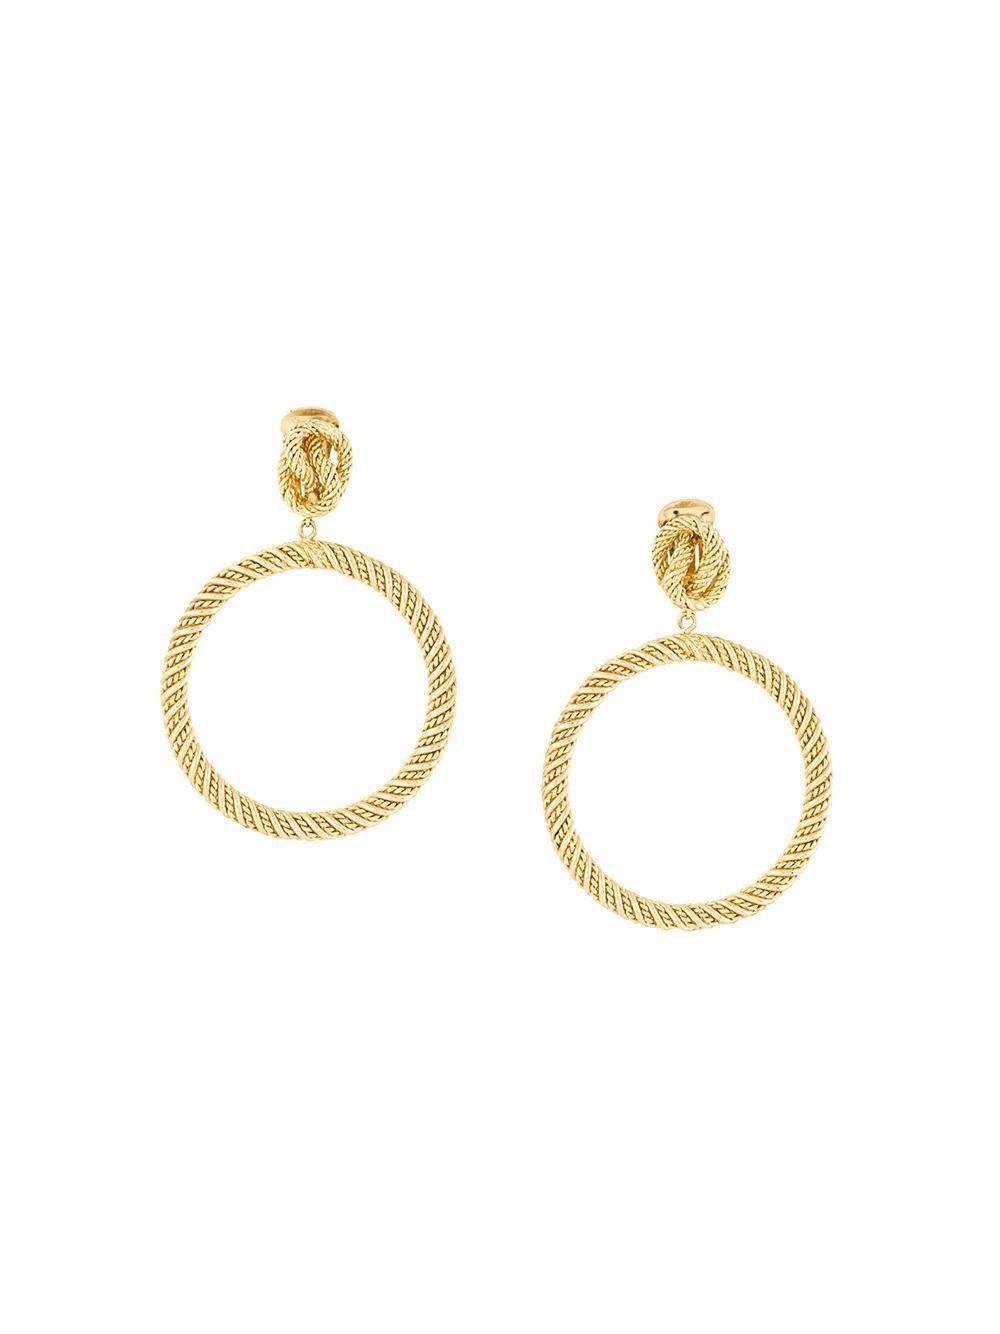 Dior Vintage Hoop Earrings Jewelry Gold The Real Slim Shady